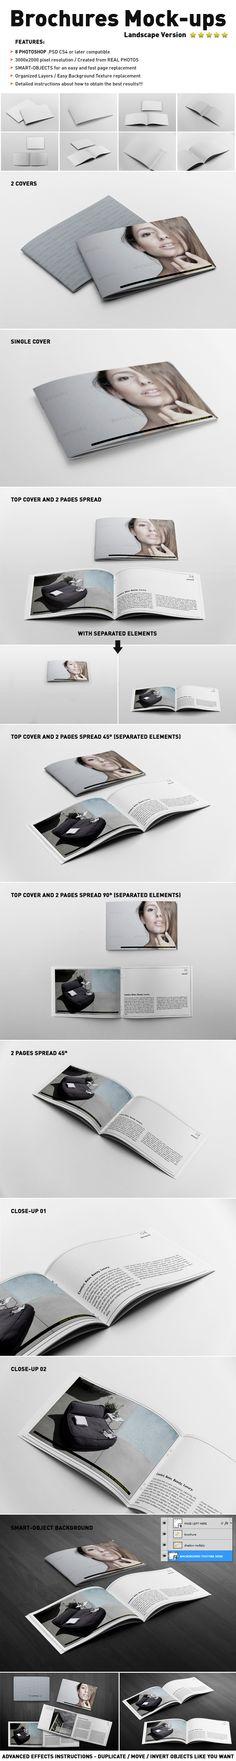 Photorealistic Brochure Mock-ups Templates by Andrea Balzano, via Behance